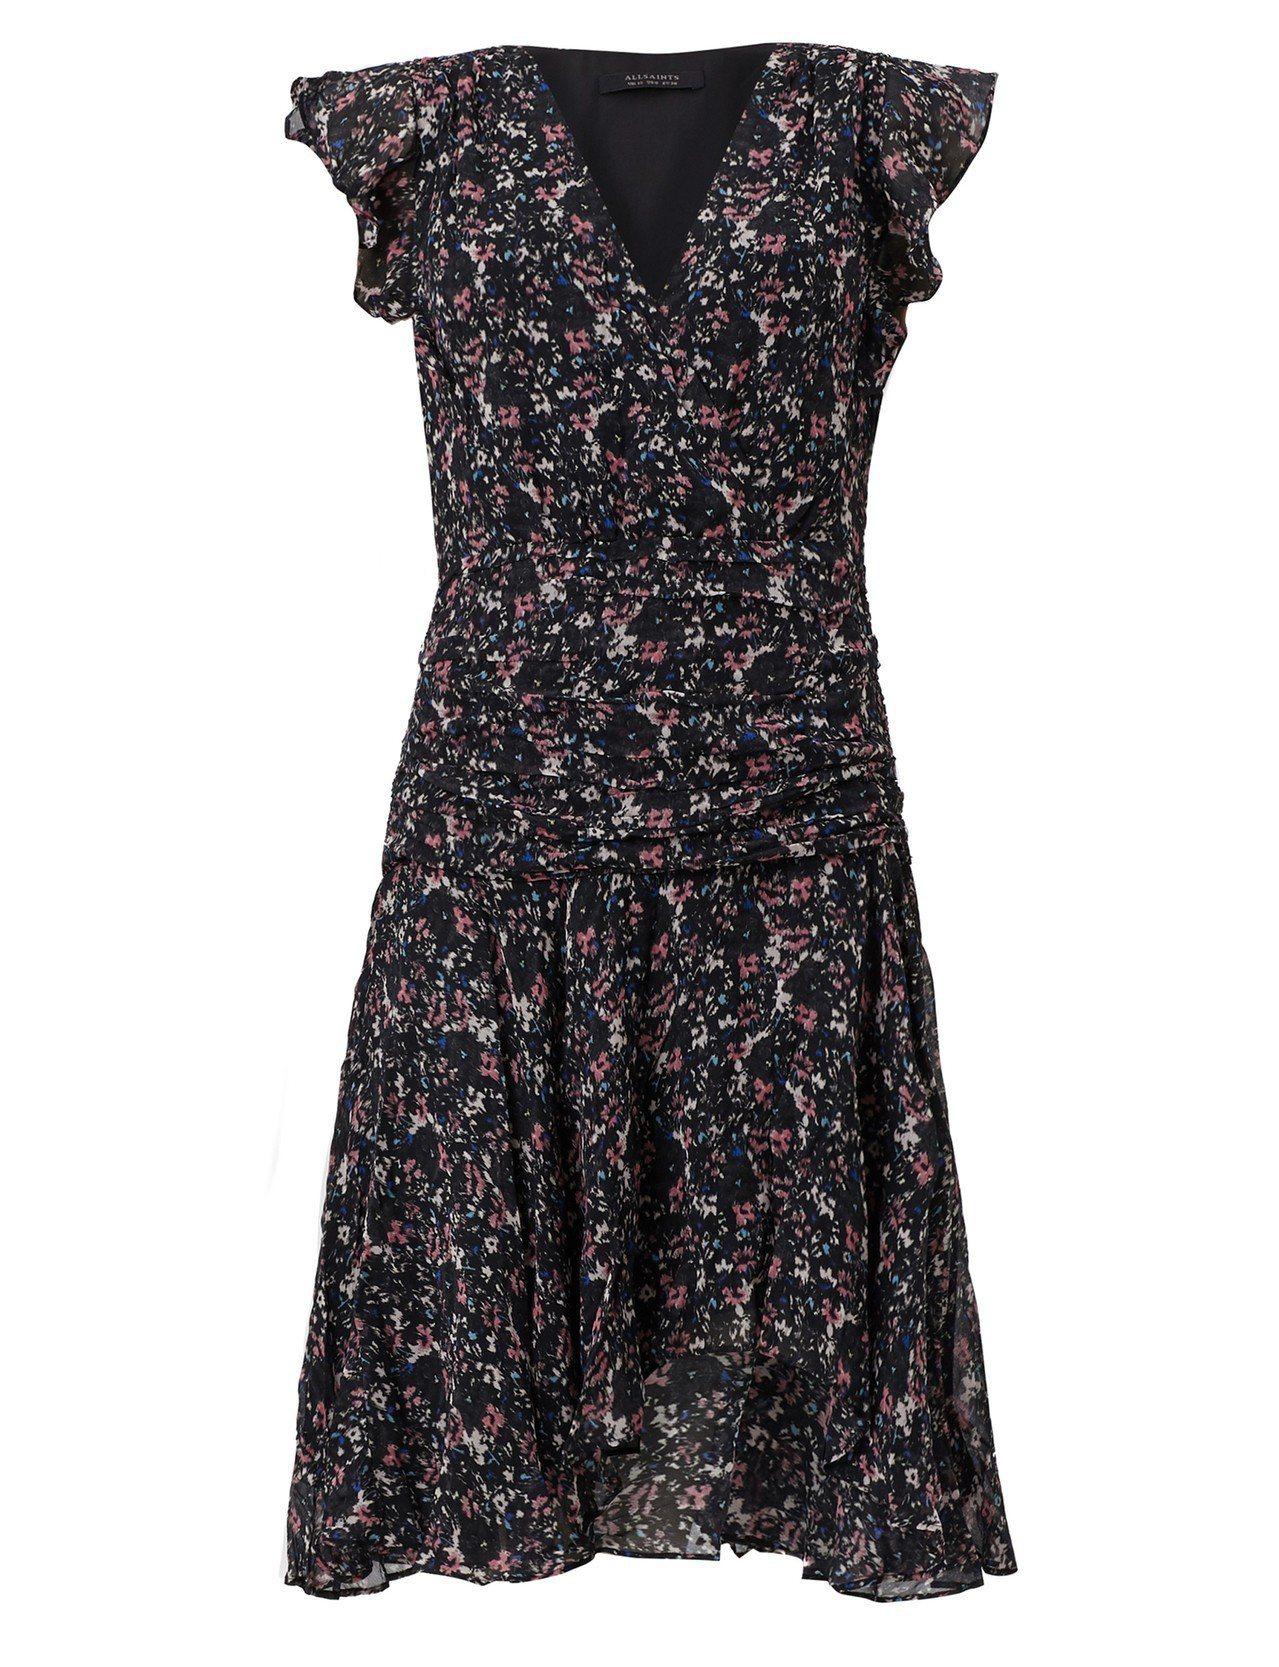 AllSaints Caris印花洋裝9,700元。圖/AllSaints提供